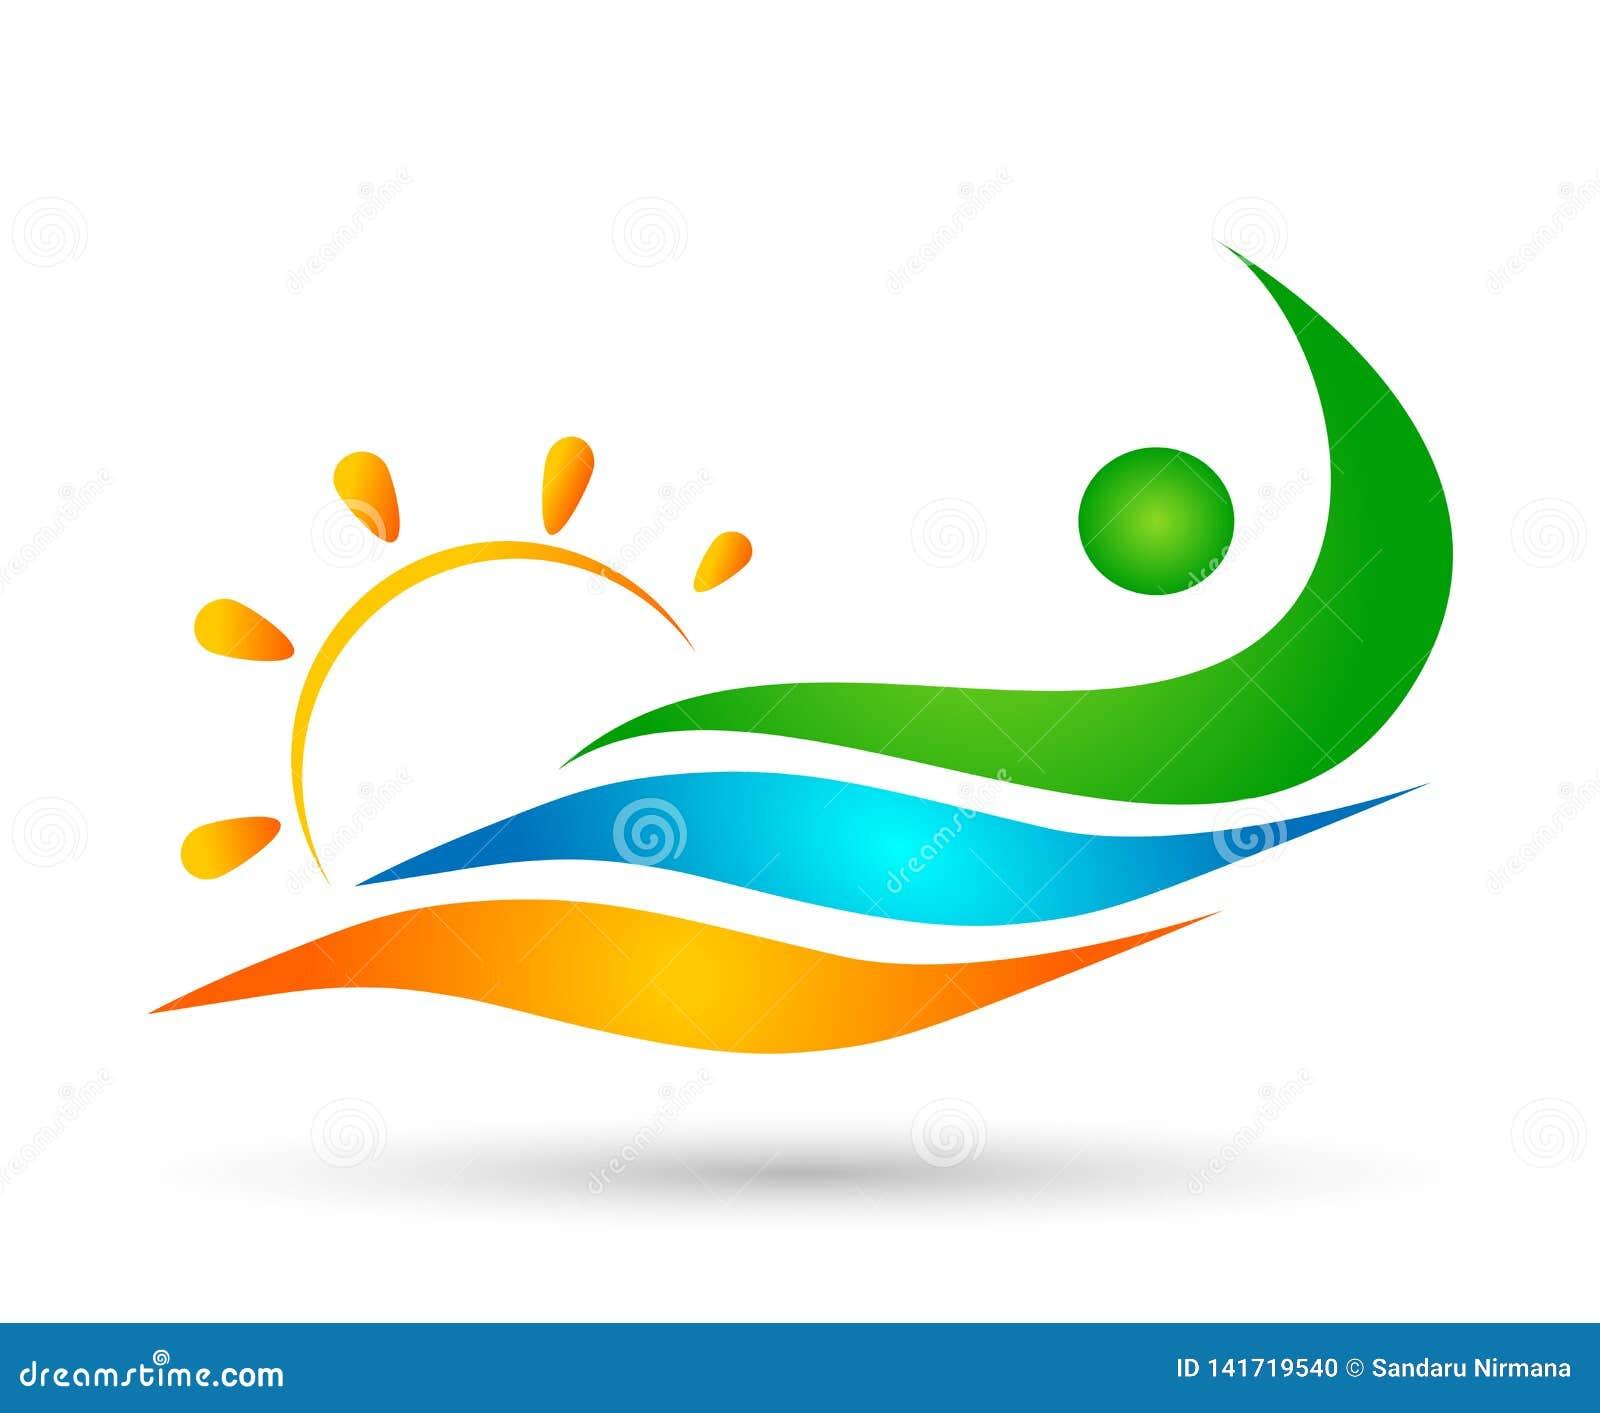 People sun sea wave water wave winning swimming logo team work celebration wellness icon vector designs on white background